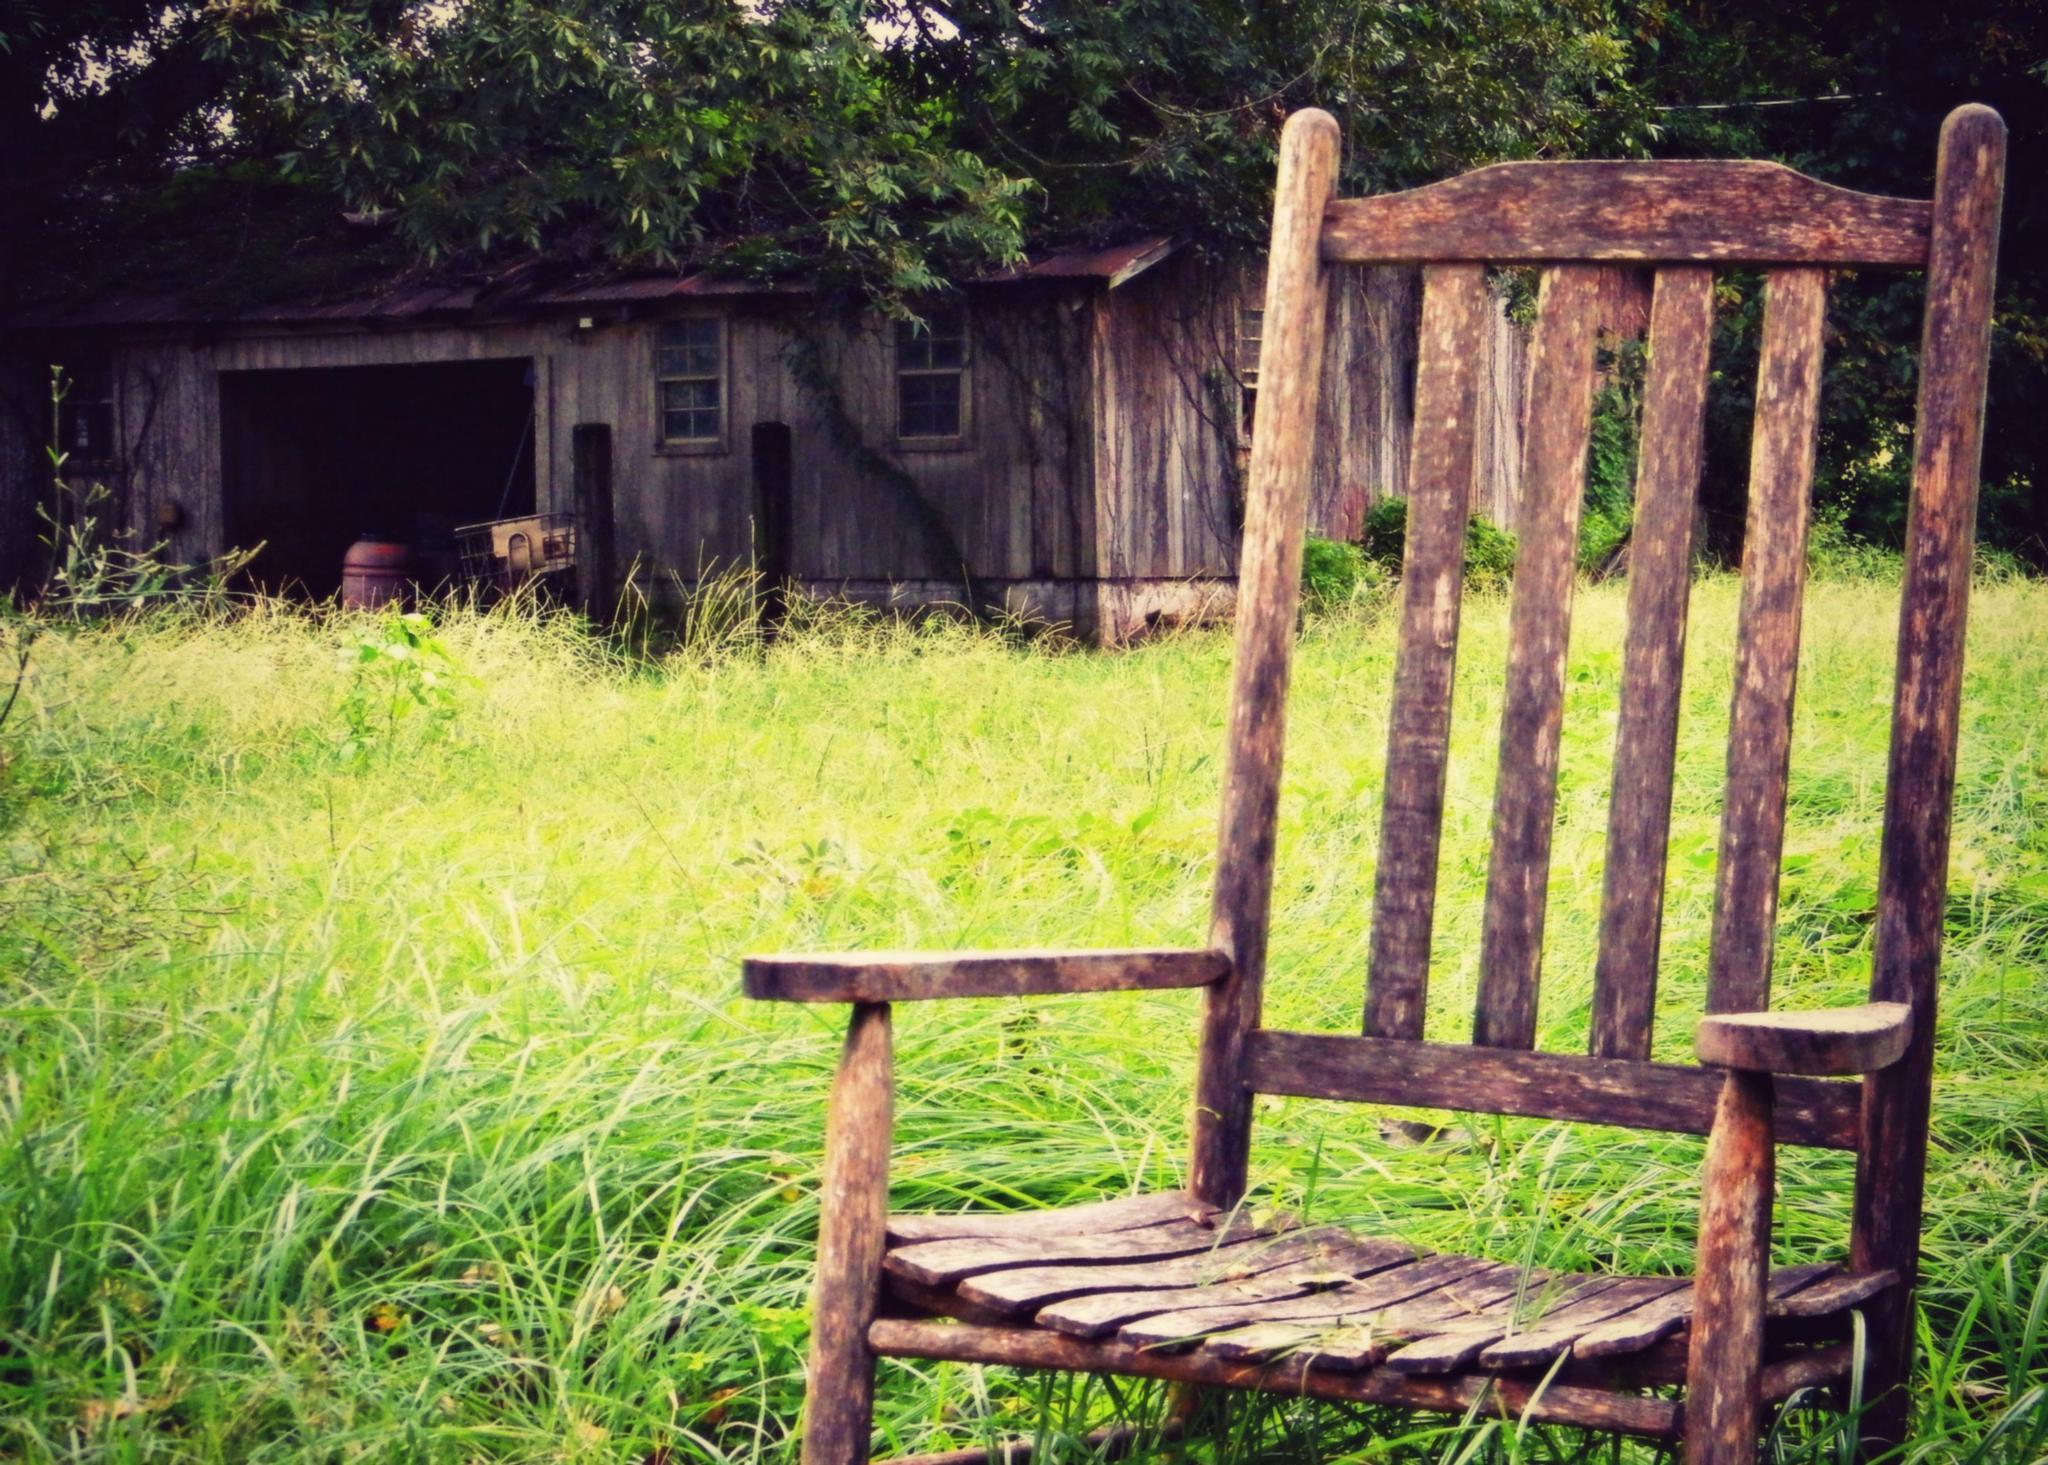 The Chair by Brenda Shirey